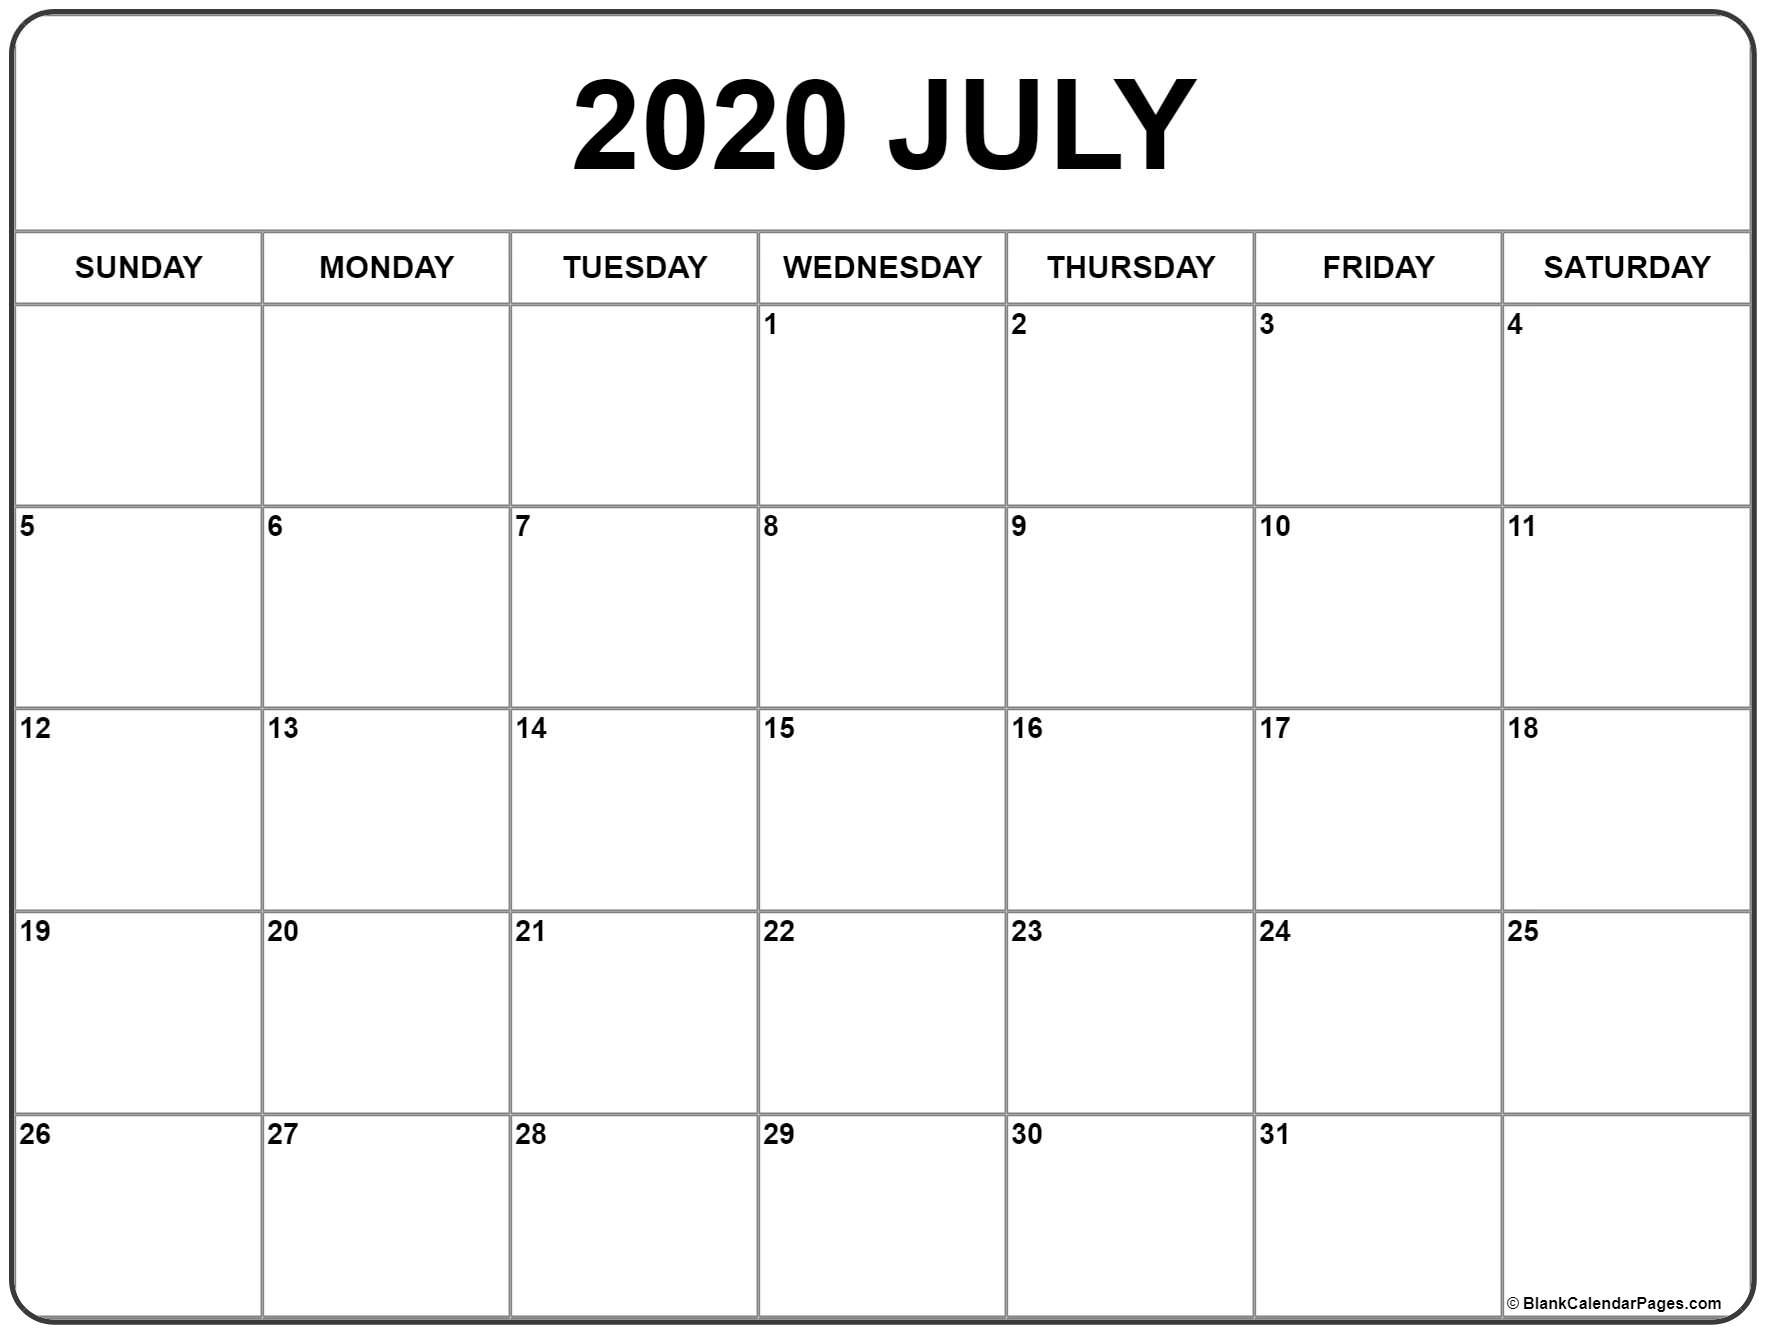 July 2020 Calendar | Free Printable Monthly Calendars within Free Printable 2020 Calendars Large Numbers